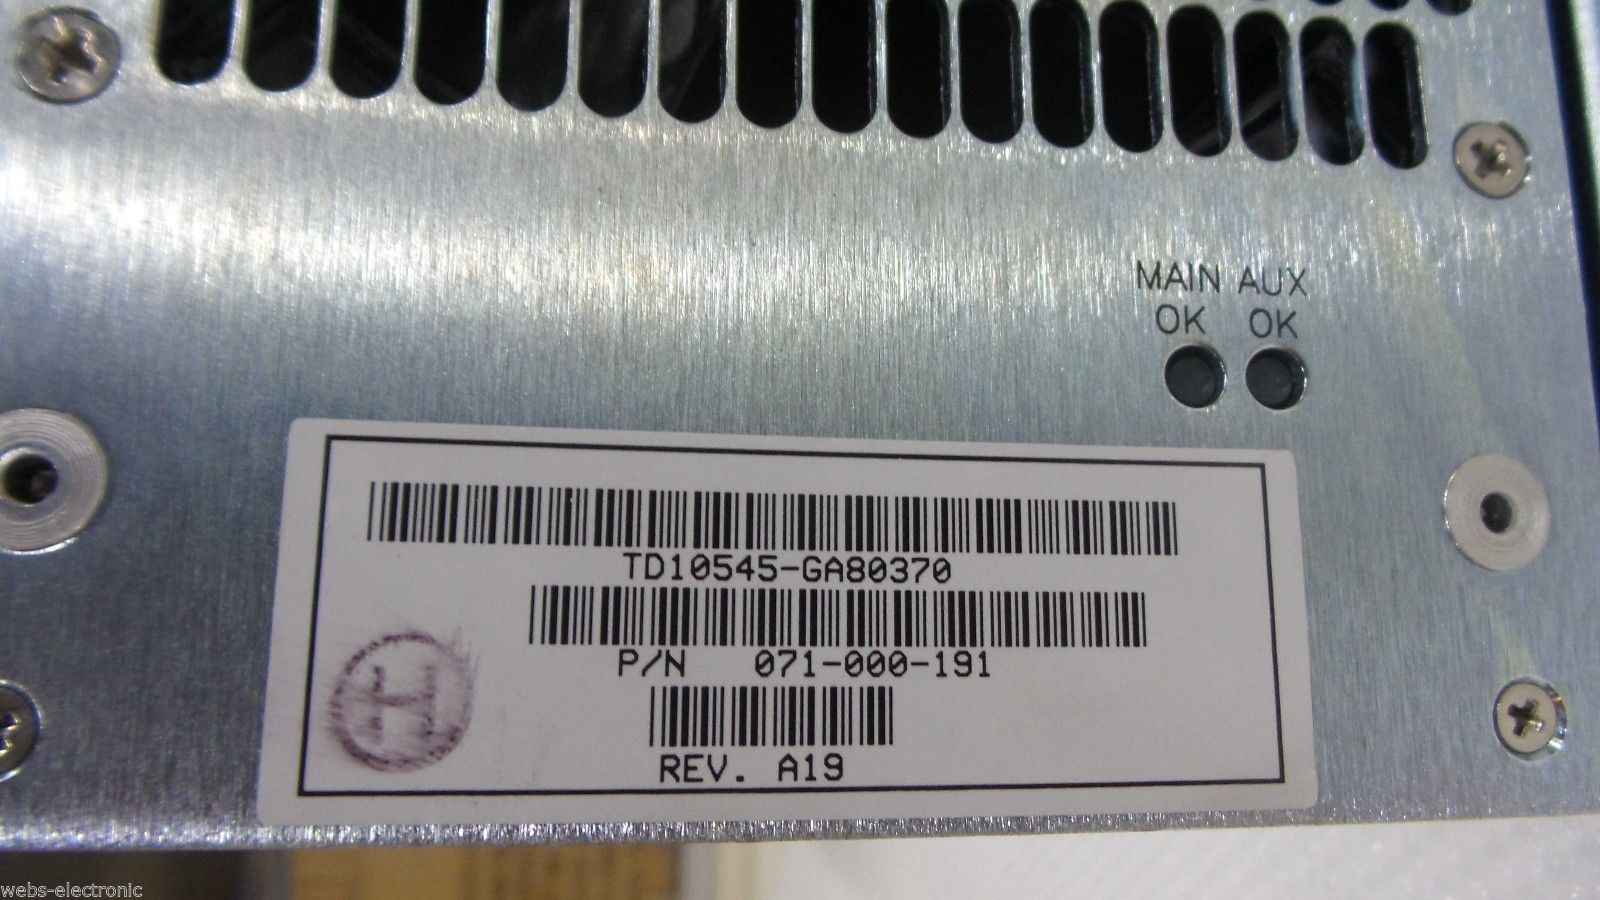 EMC 071-000-191 DMX1000/2000 175W Power Supply td10545-ga80370_3